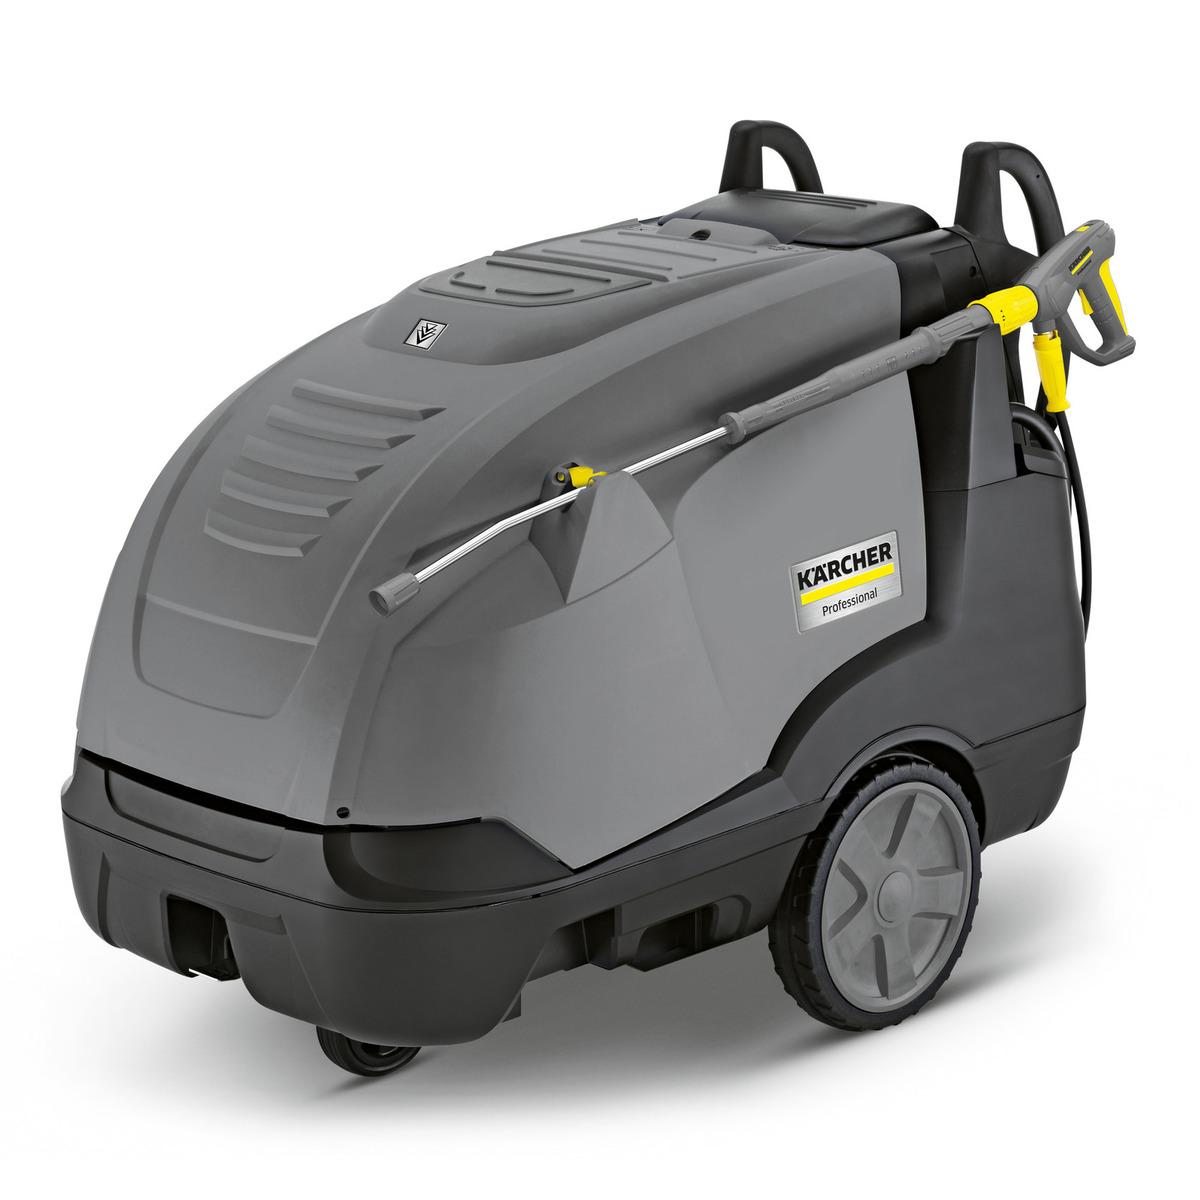 HDS-E 8/16-4 M 12 kW热水高压清洗机